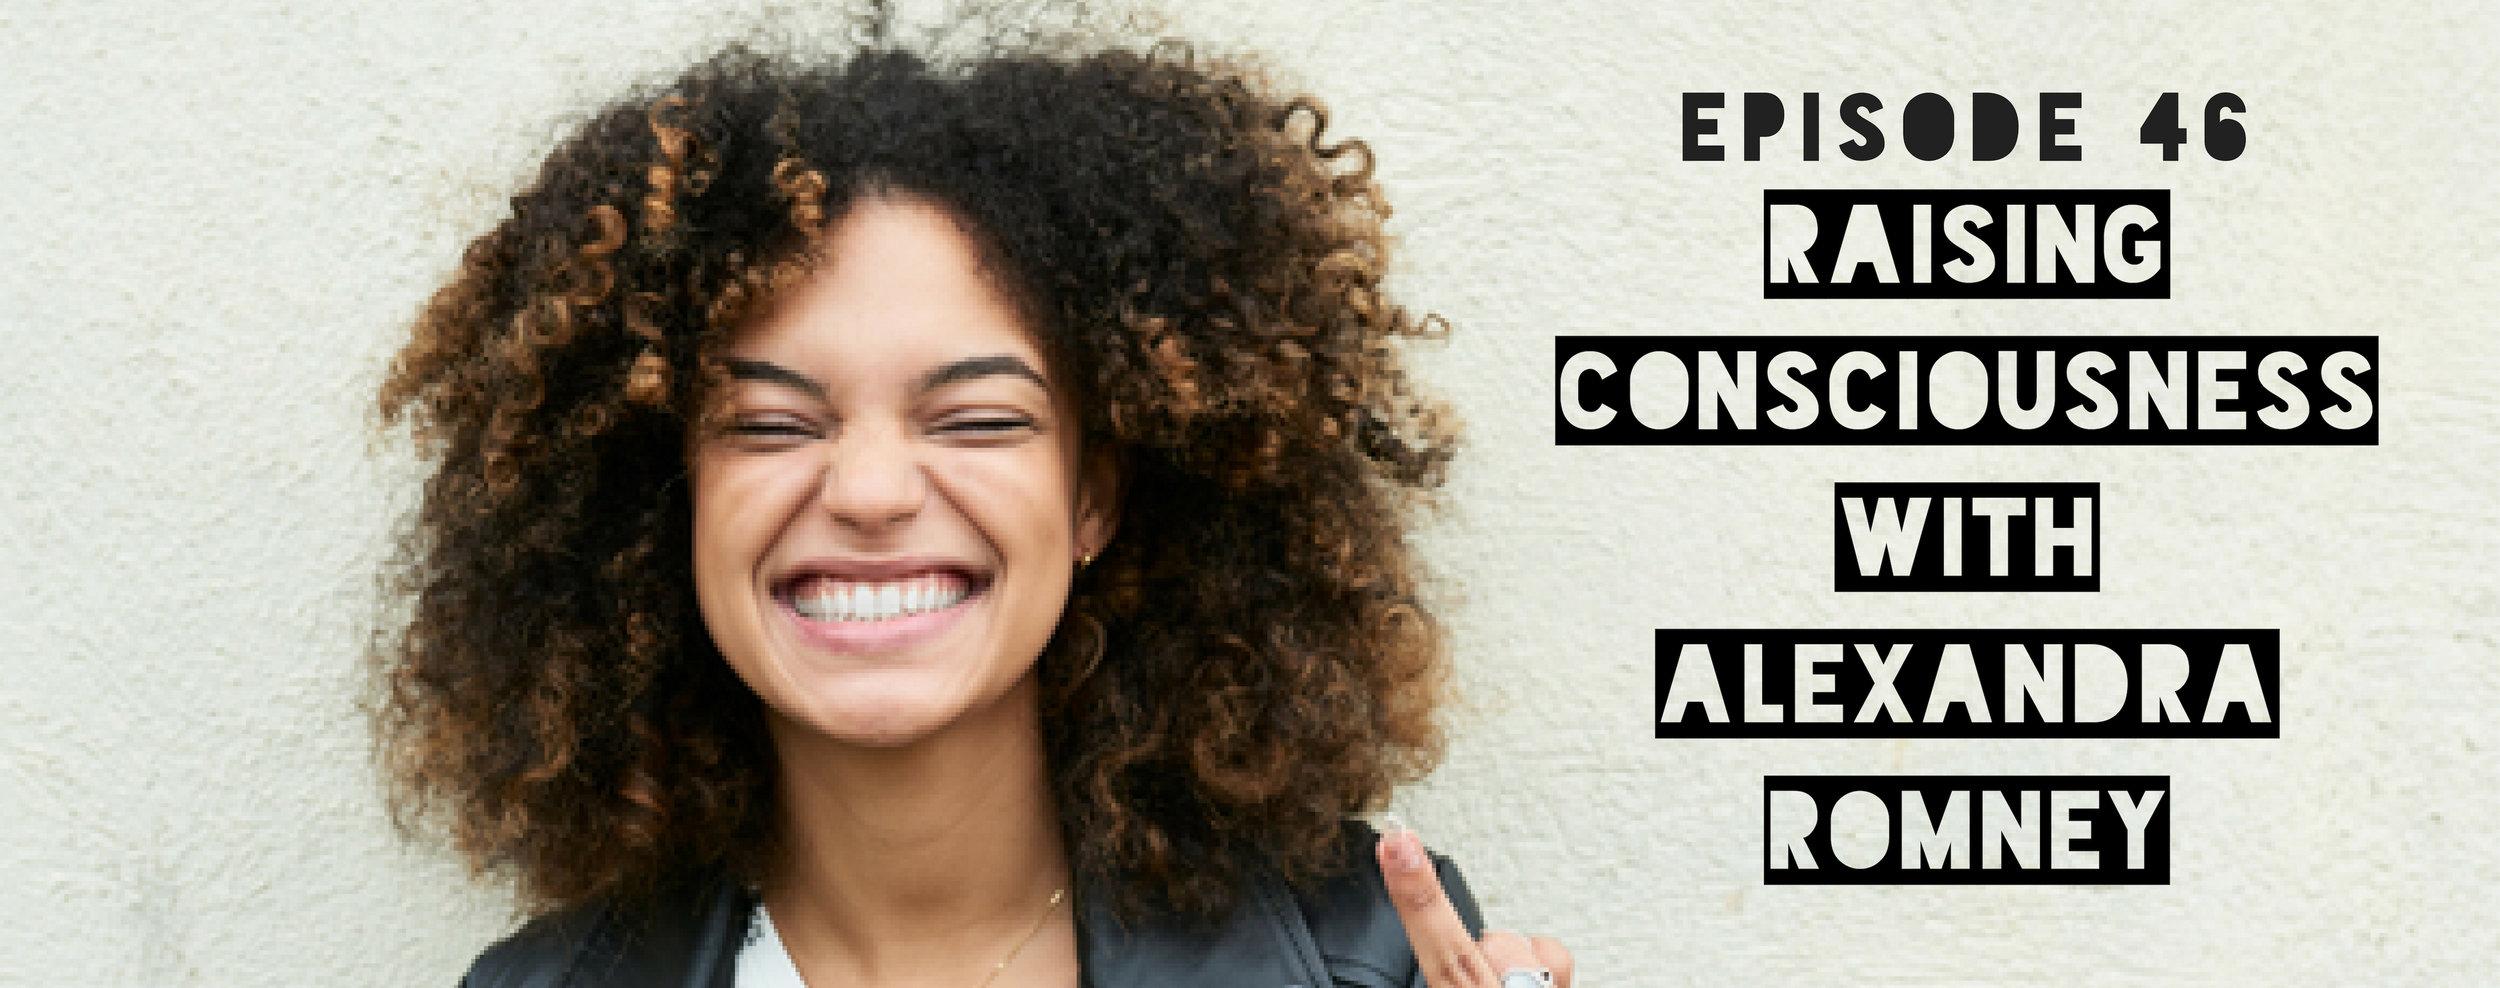 MFTP Episode 46: Raising Consciousness with Alexandra Romney